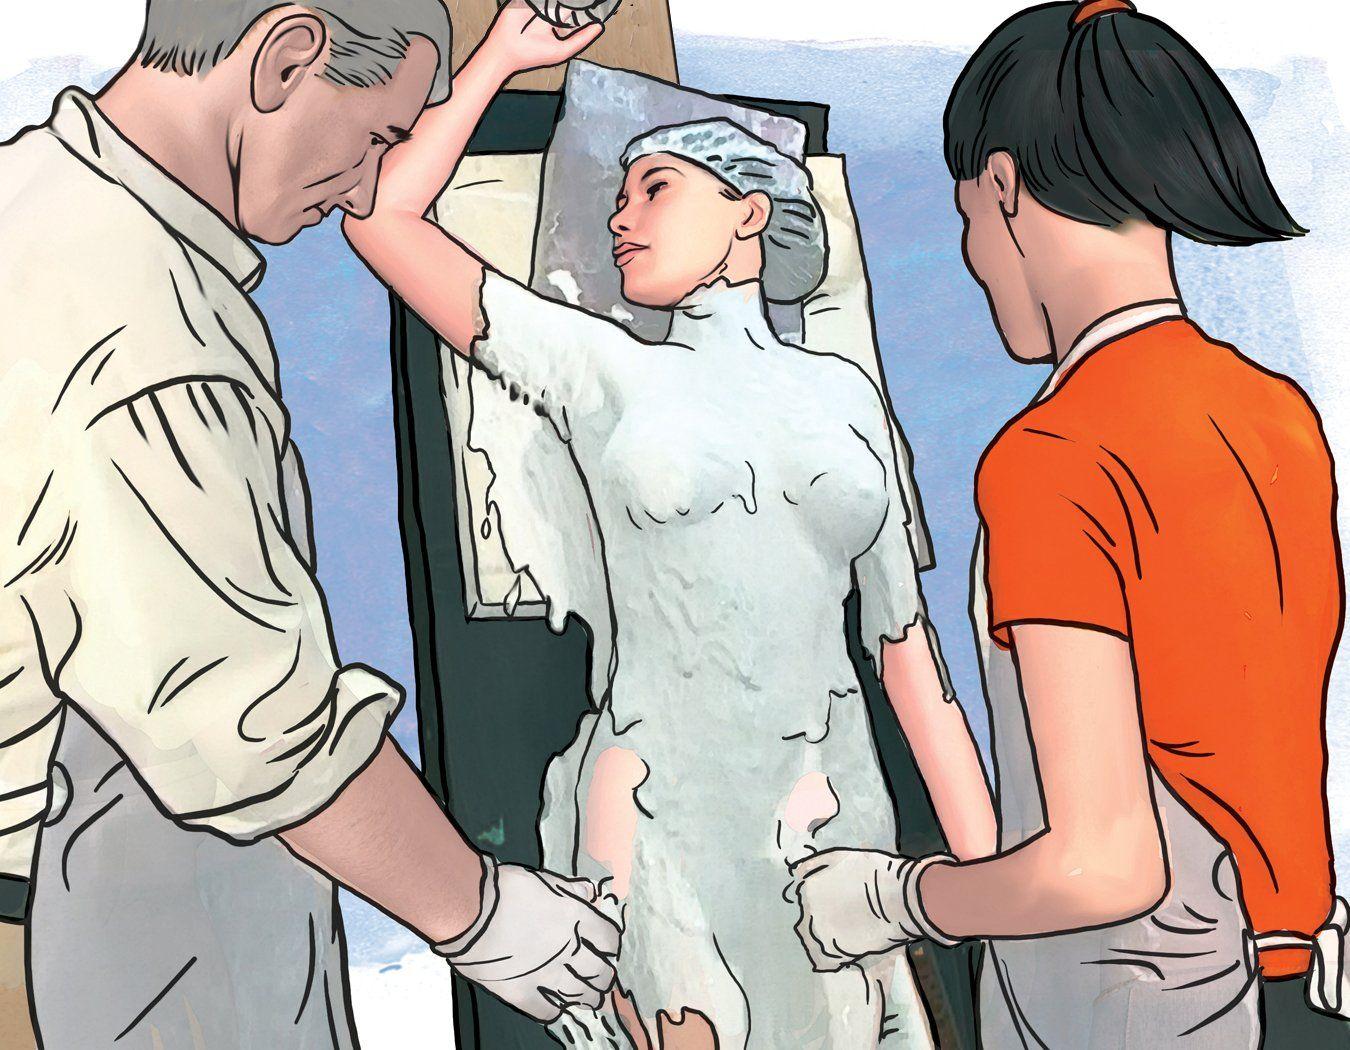 Casting the Nude Female Torso - Step 9